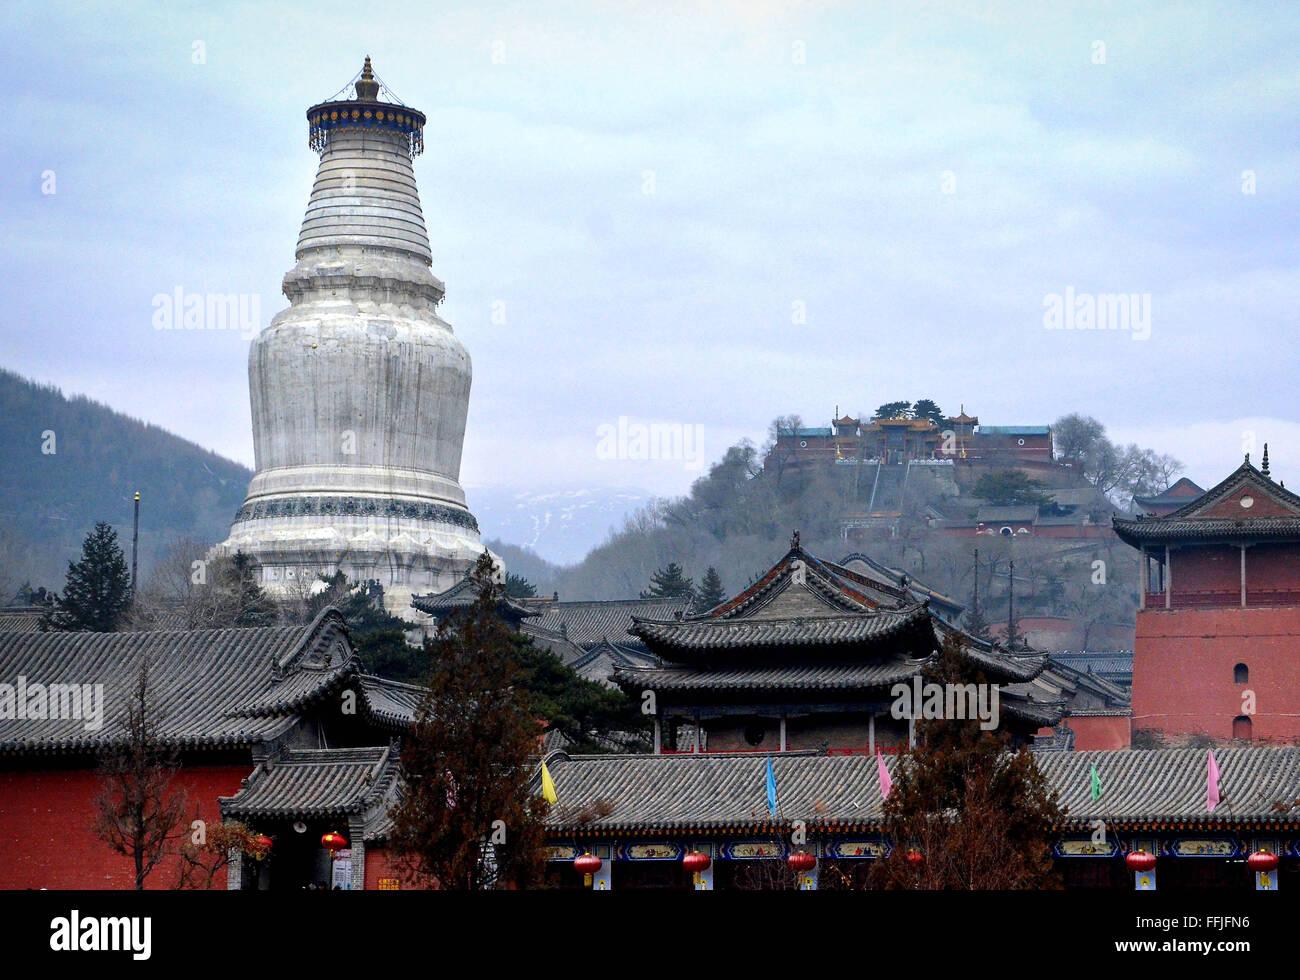 Beijing, China. 3rd Nov, 2011. Photo taken on Nov. 3, 2011 shows the White Pagoda at the Tayuan Monastery on Mount - Stock Image